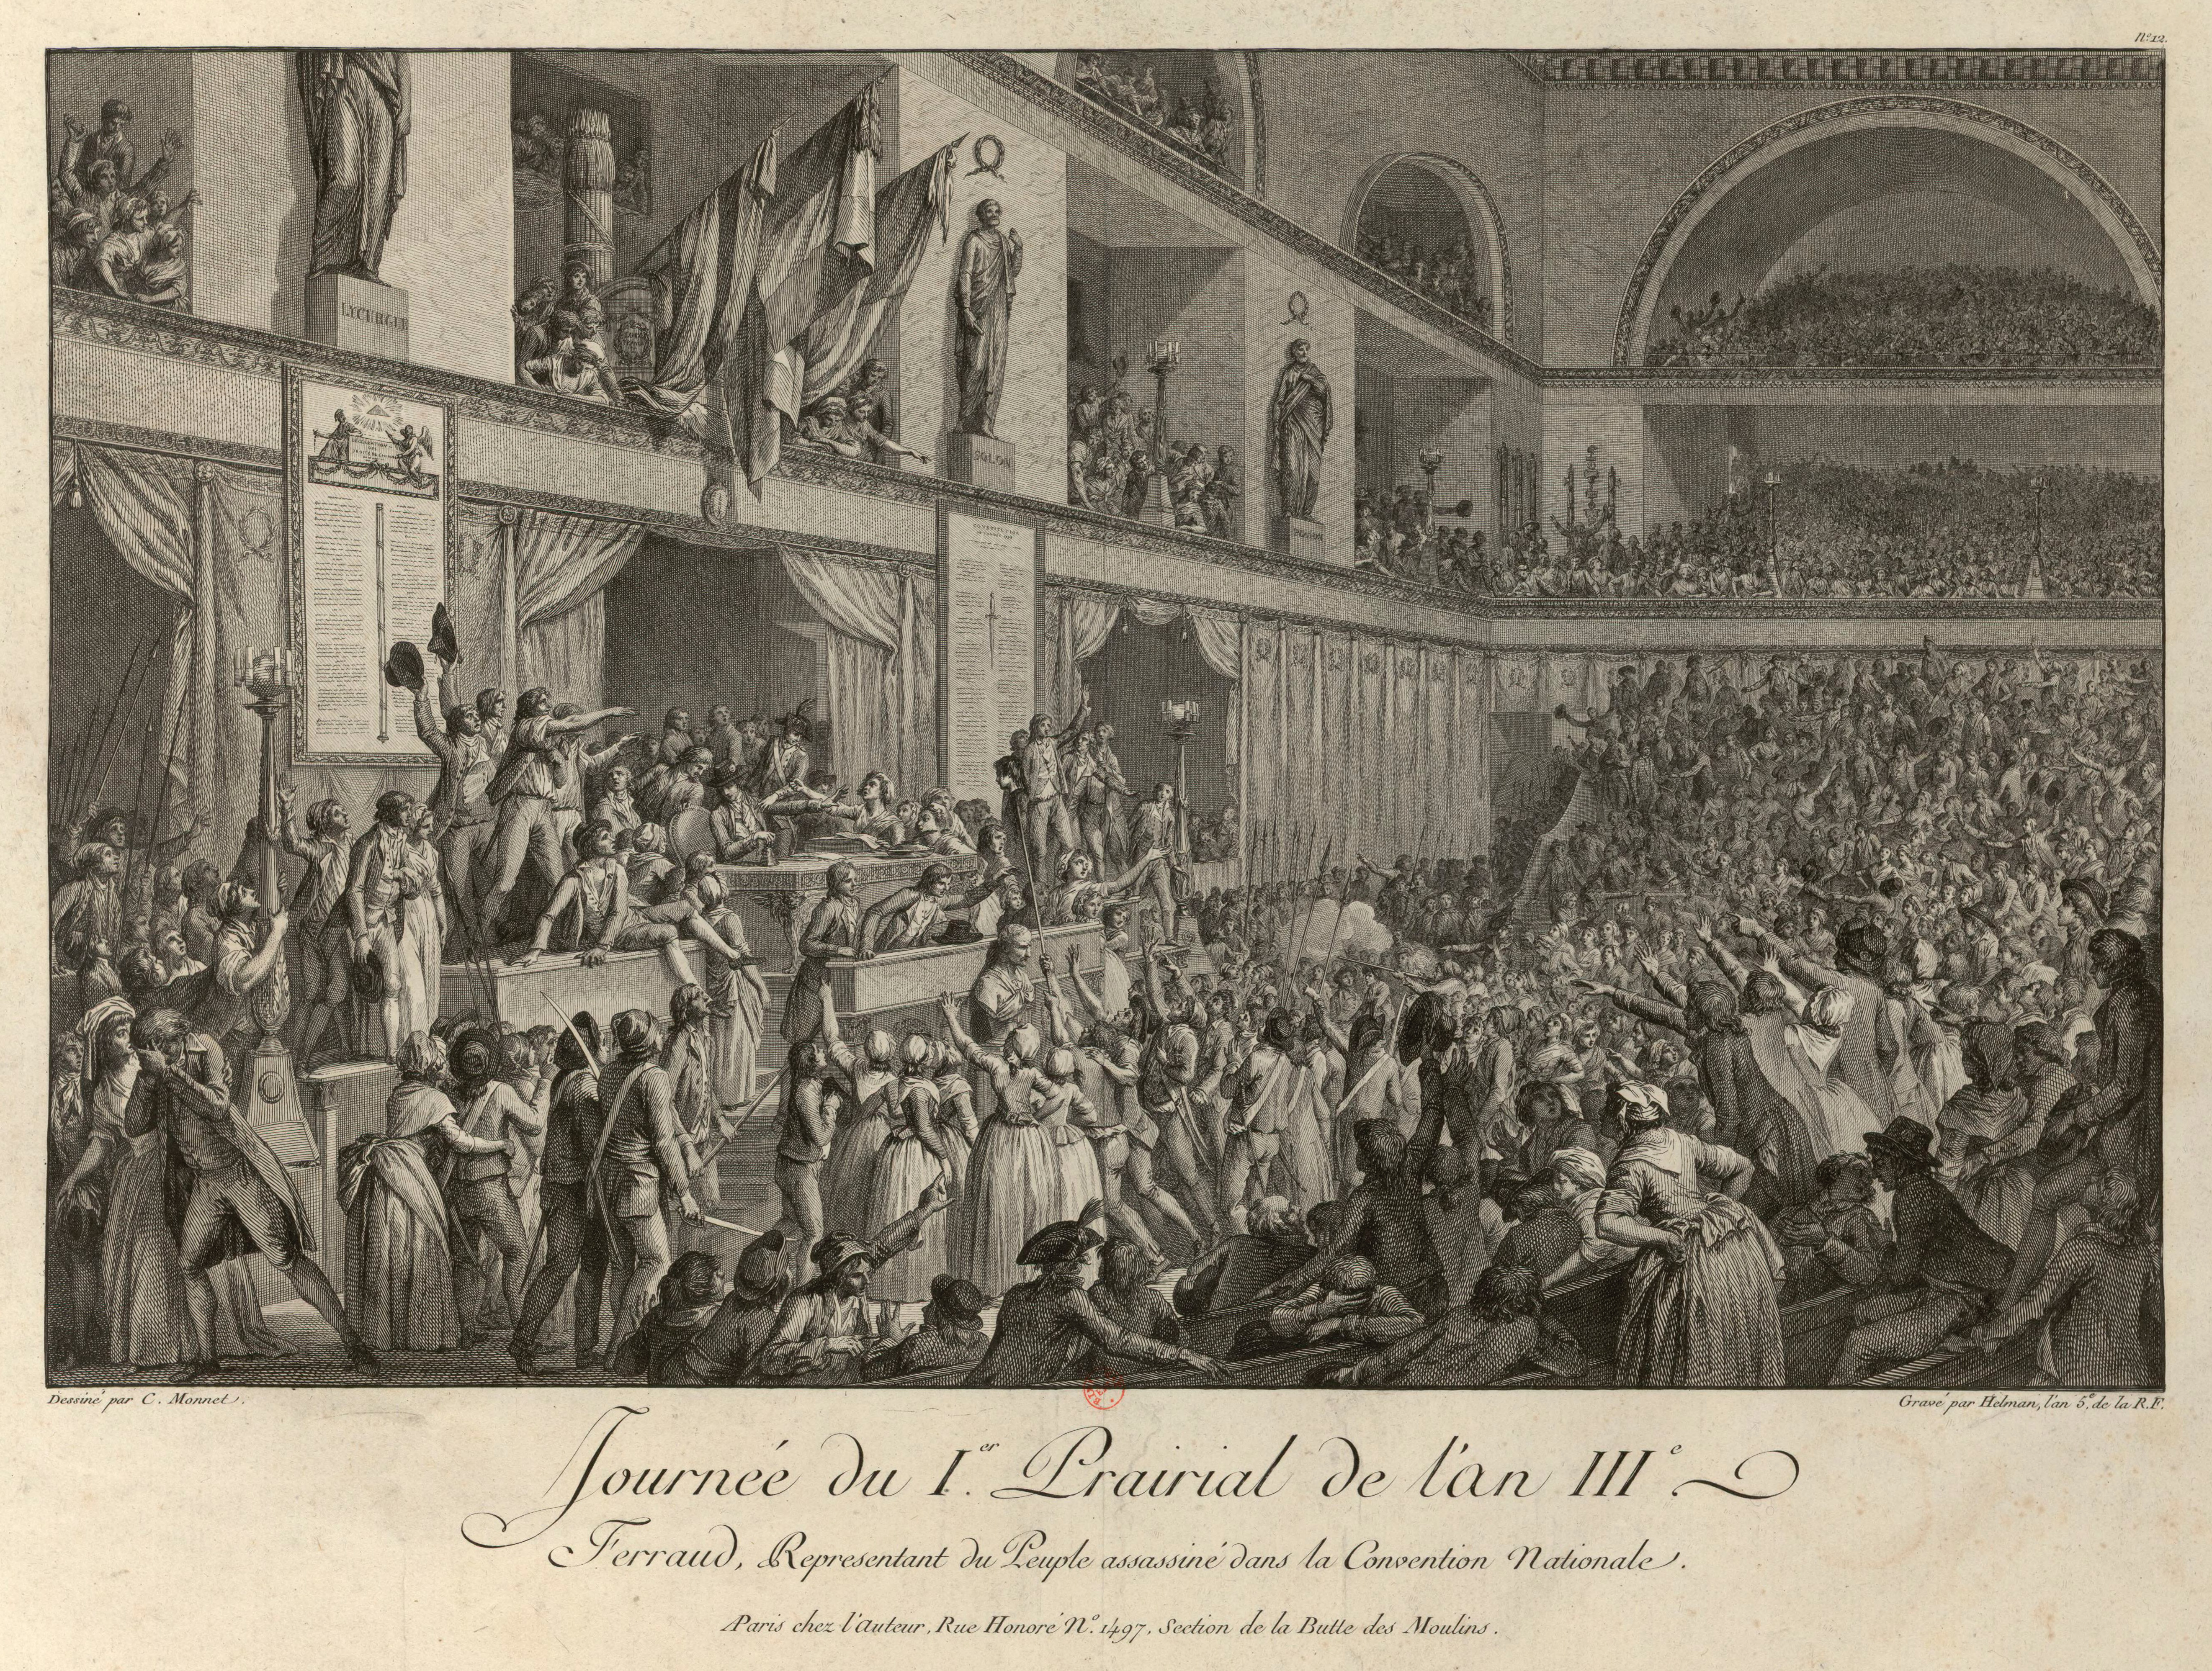 149 Rue Saint Honoré revolt of 1 prairial year iii - wikipedia